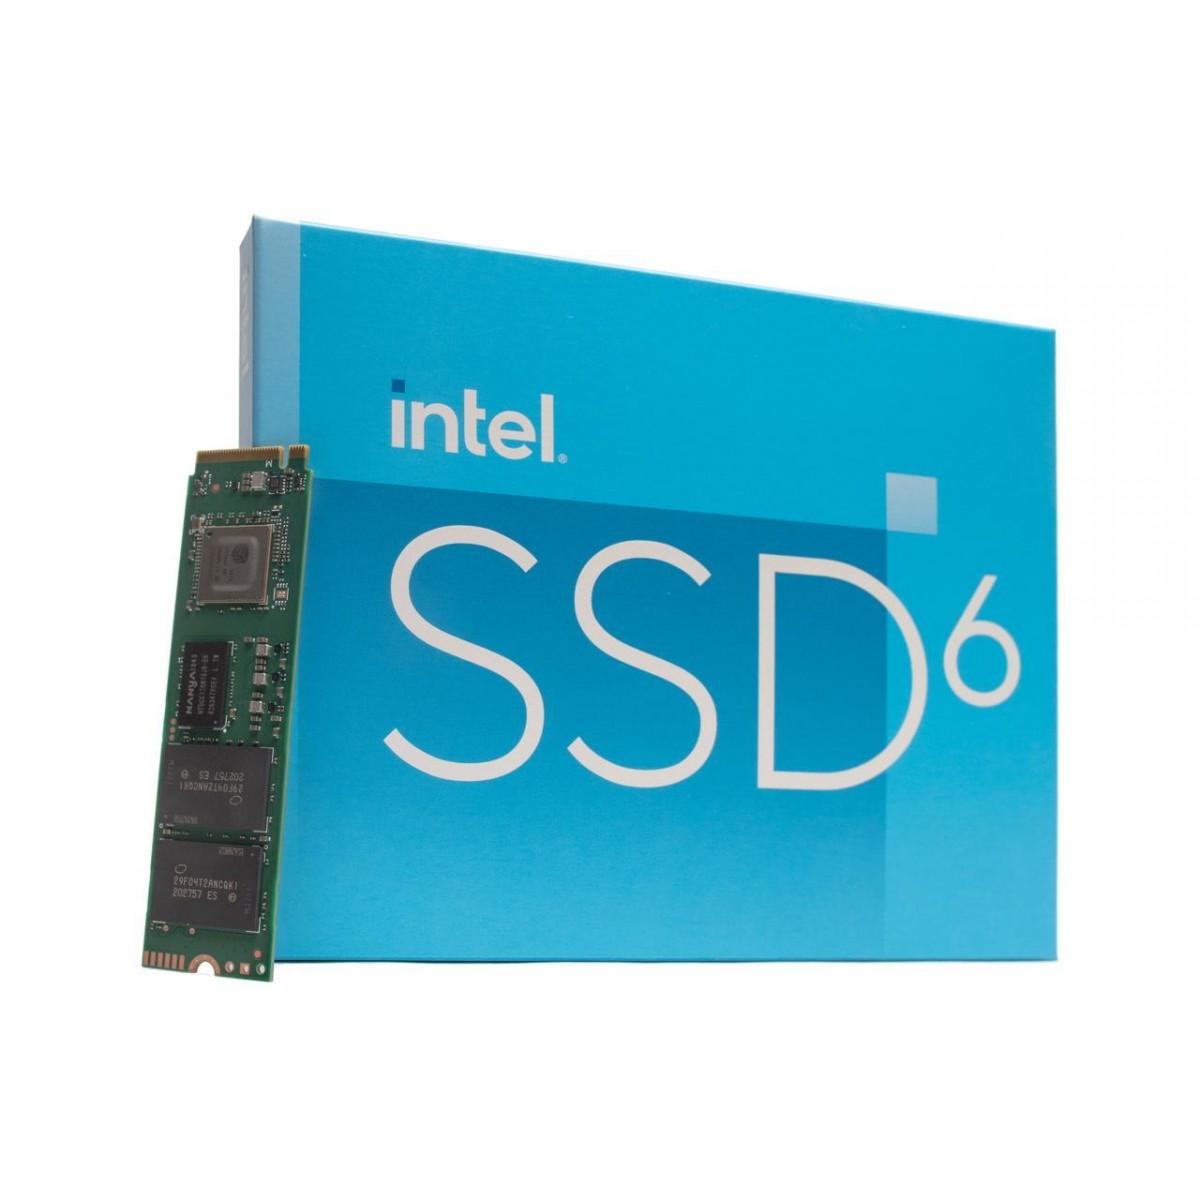 SSD Intel 670P, 512GB, M.2 NVMe, Leitura 3000MBs, Escrita 1600MBs, SSDPEKNU512GZX1